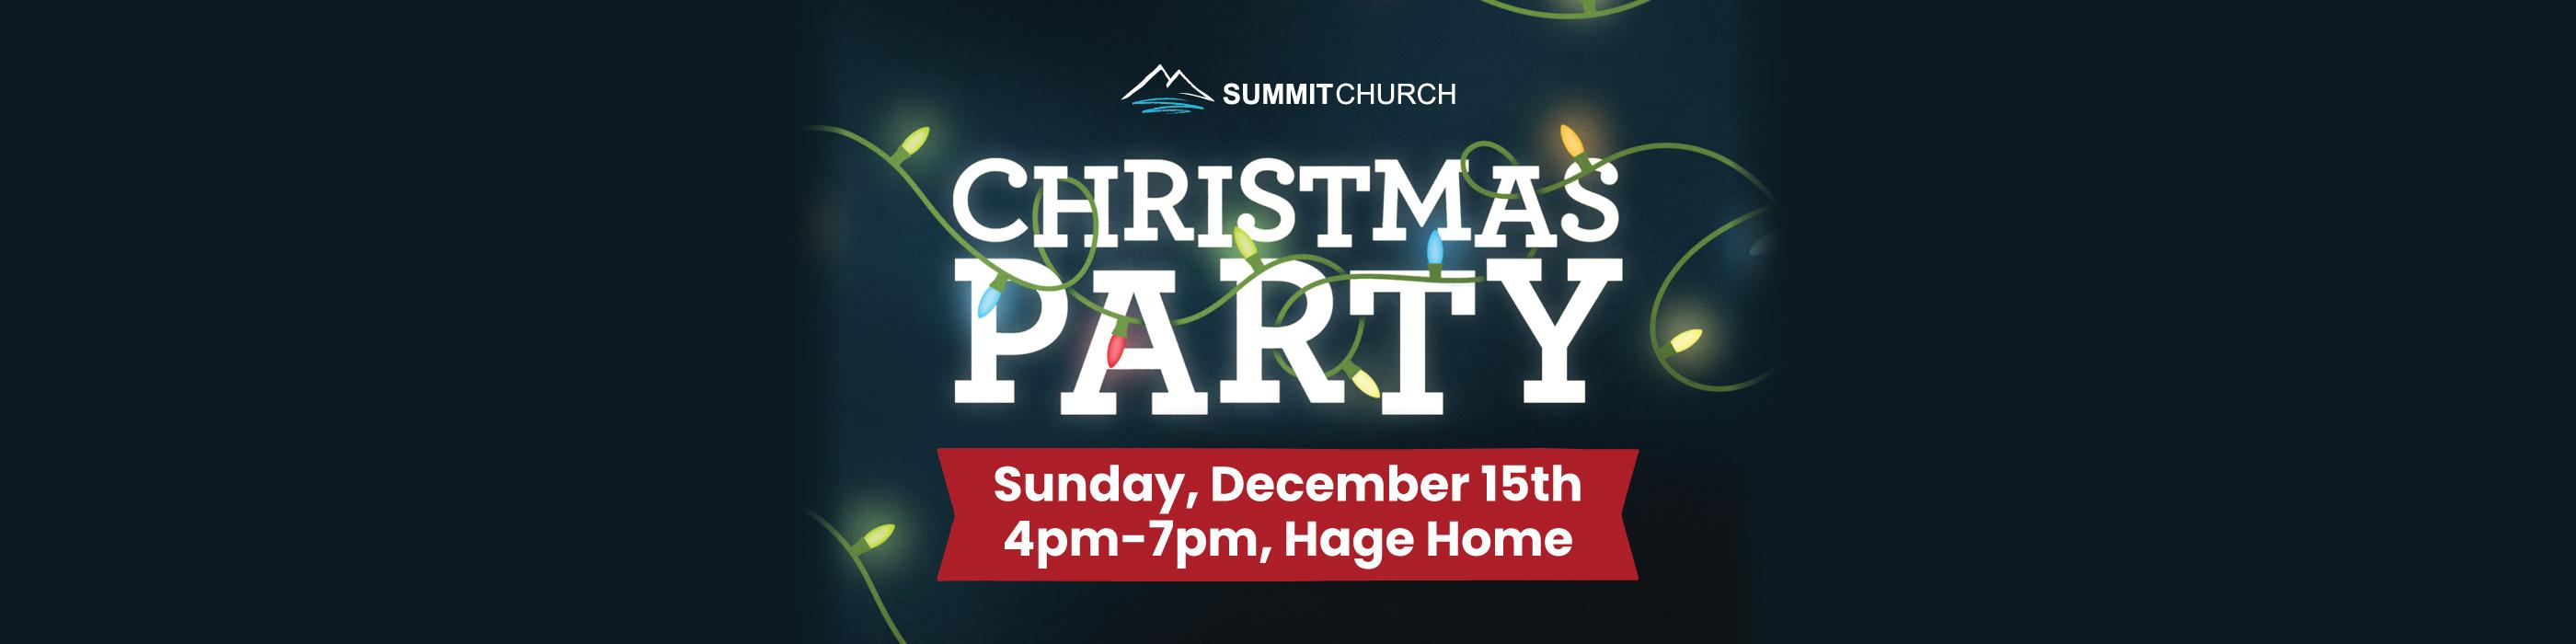 Summit-Christmas-Party-121519-WEB-2800x700